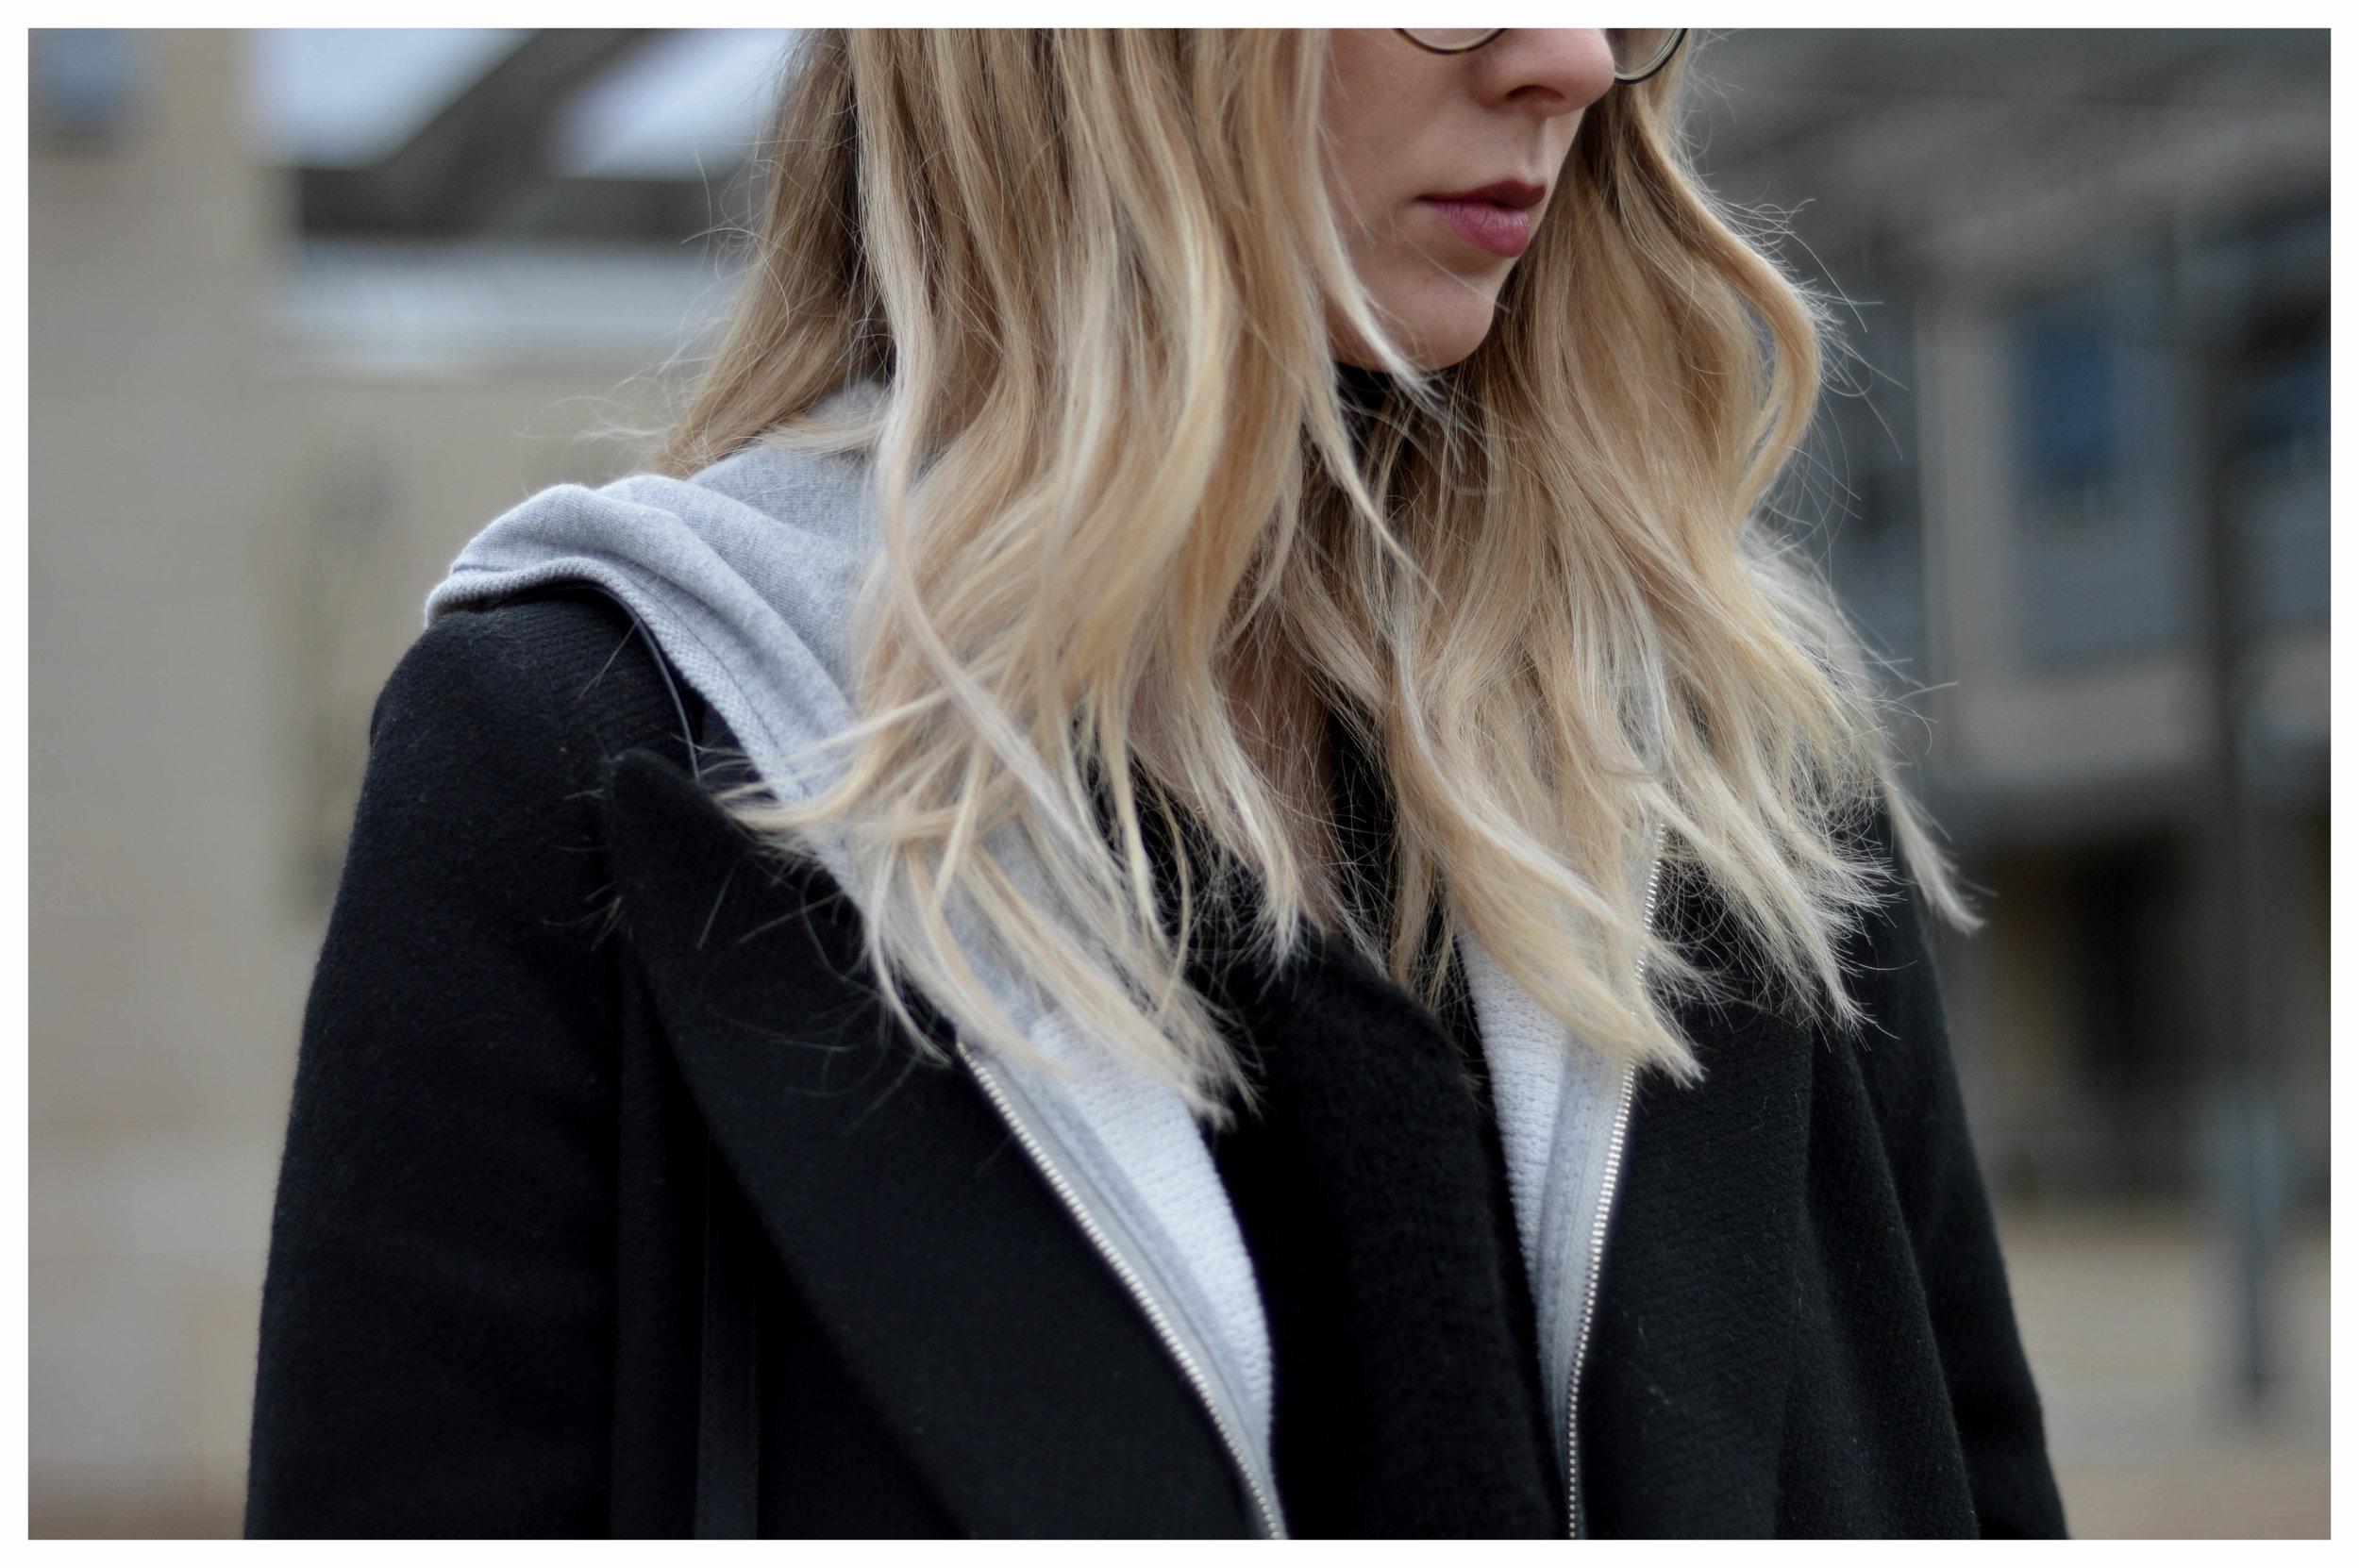 Black Coat Hoodie & Ripped Jeans - OSIARAH.COM (36 sur 54).jpg